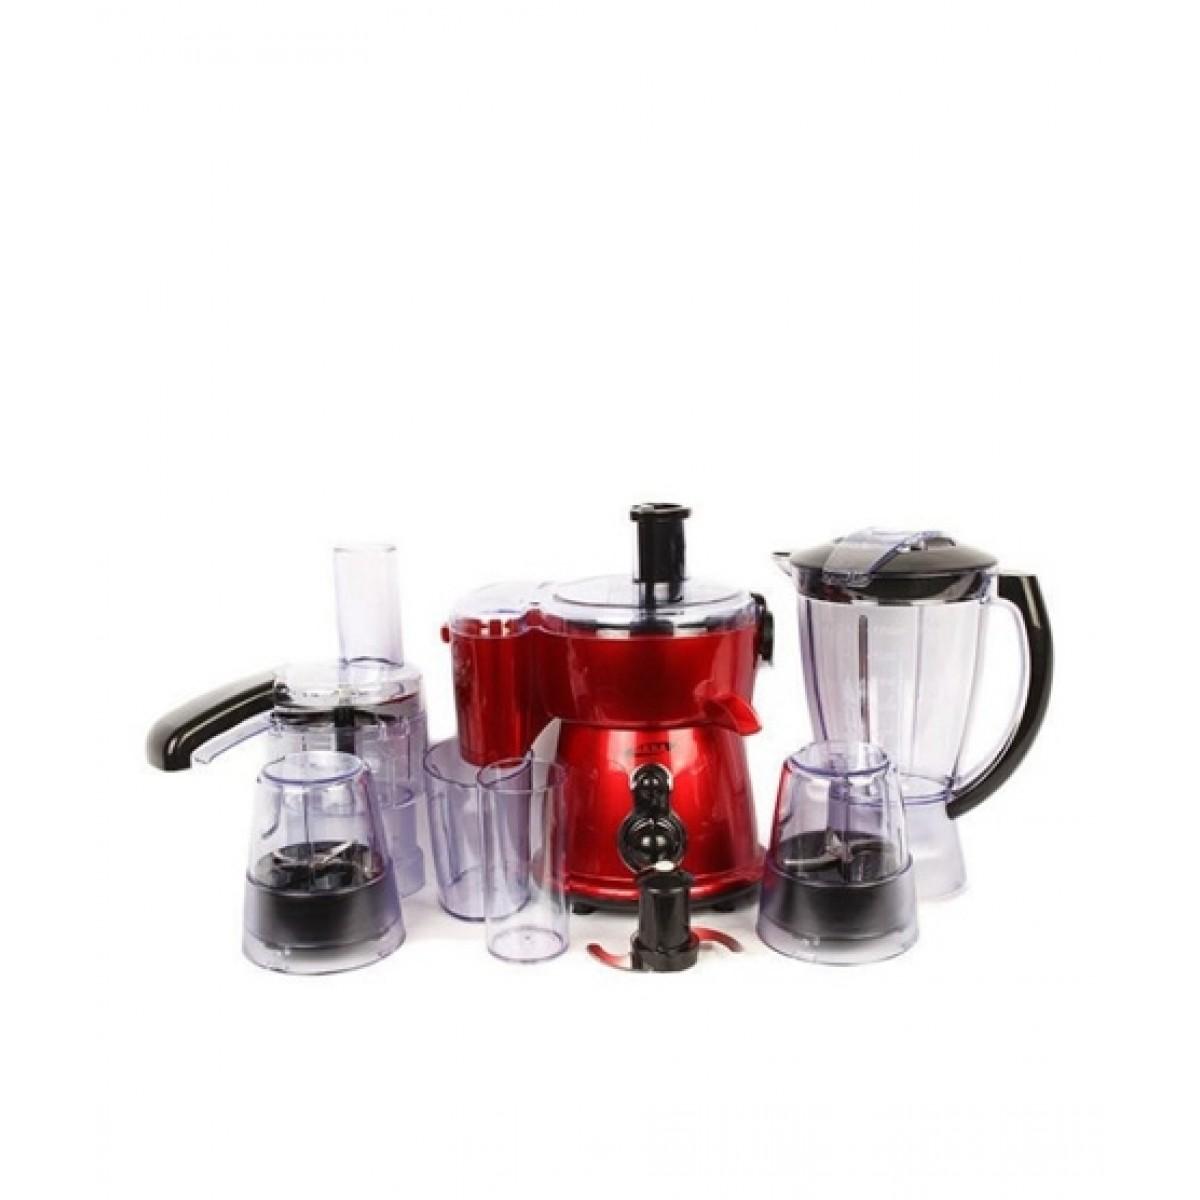 Gaba National Food Processor Red (GN-922-DLX)